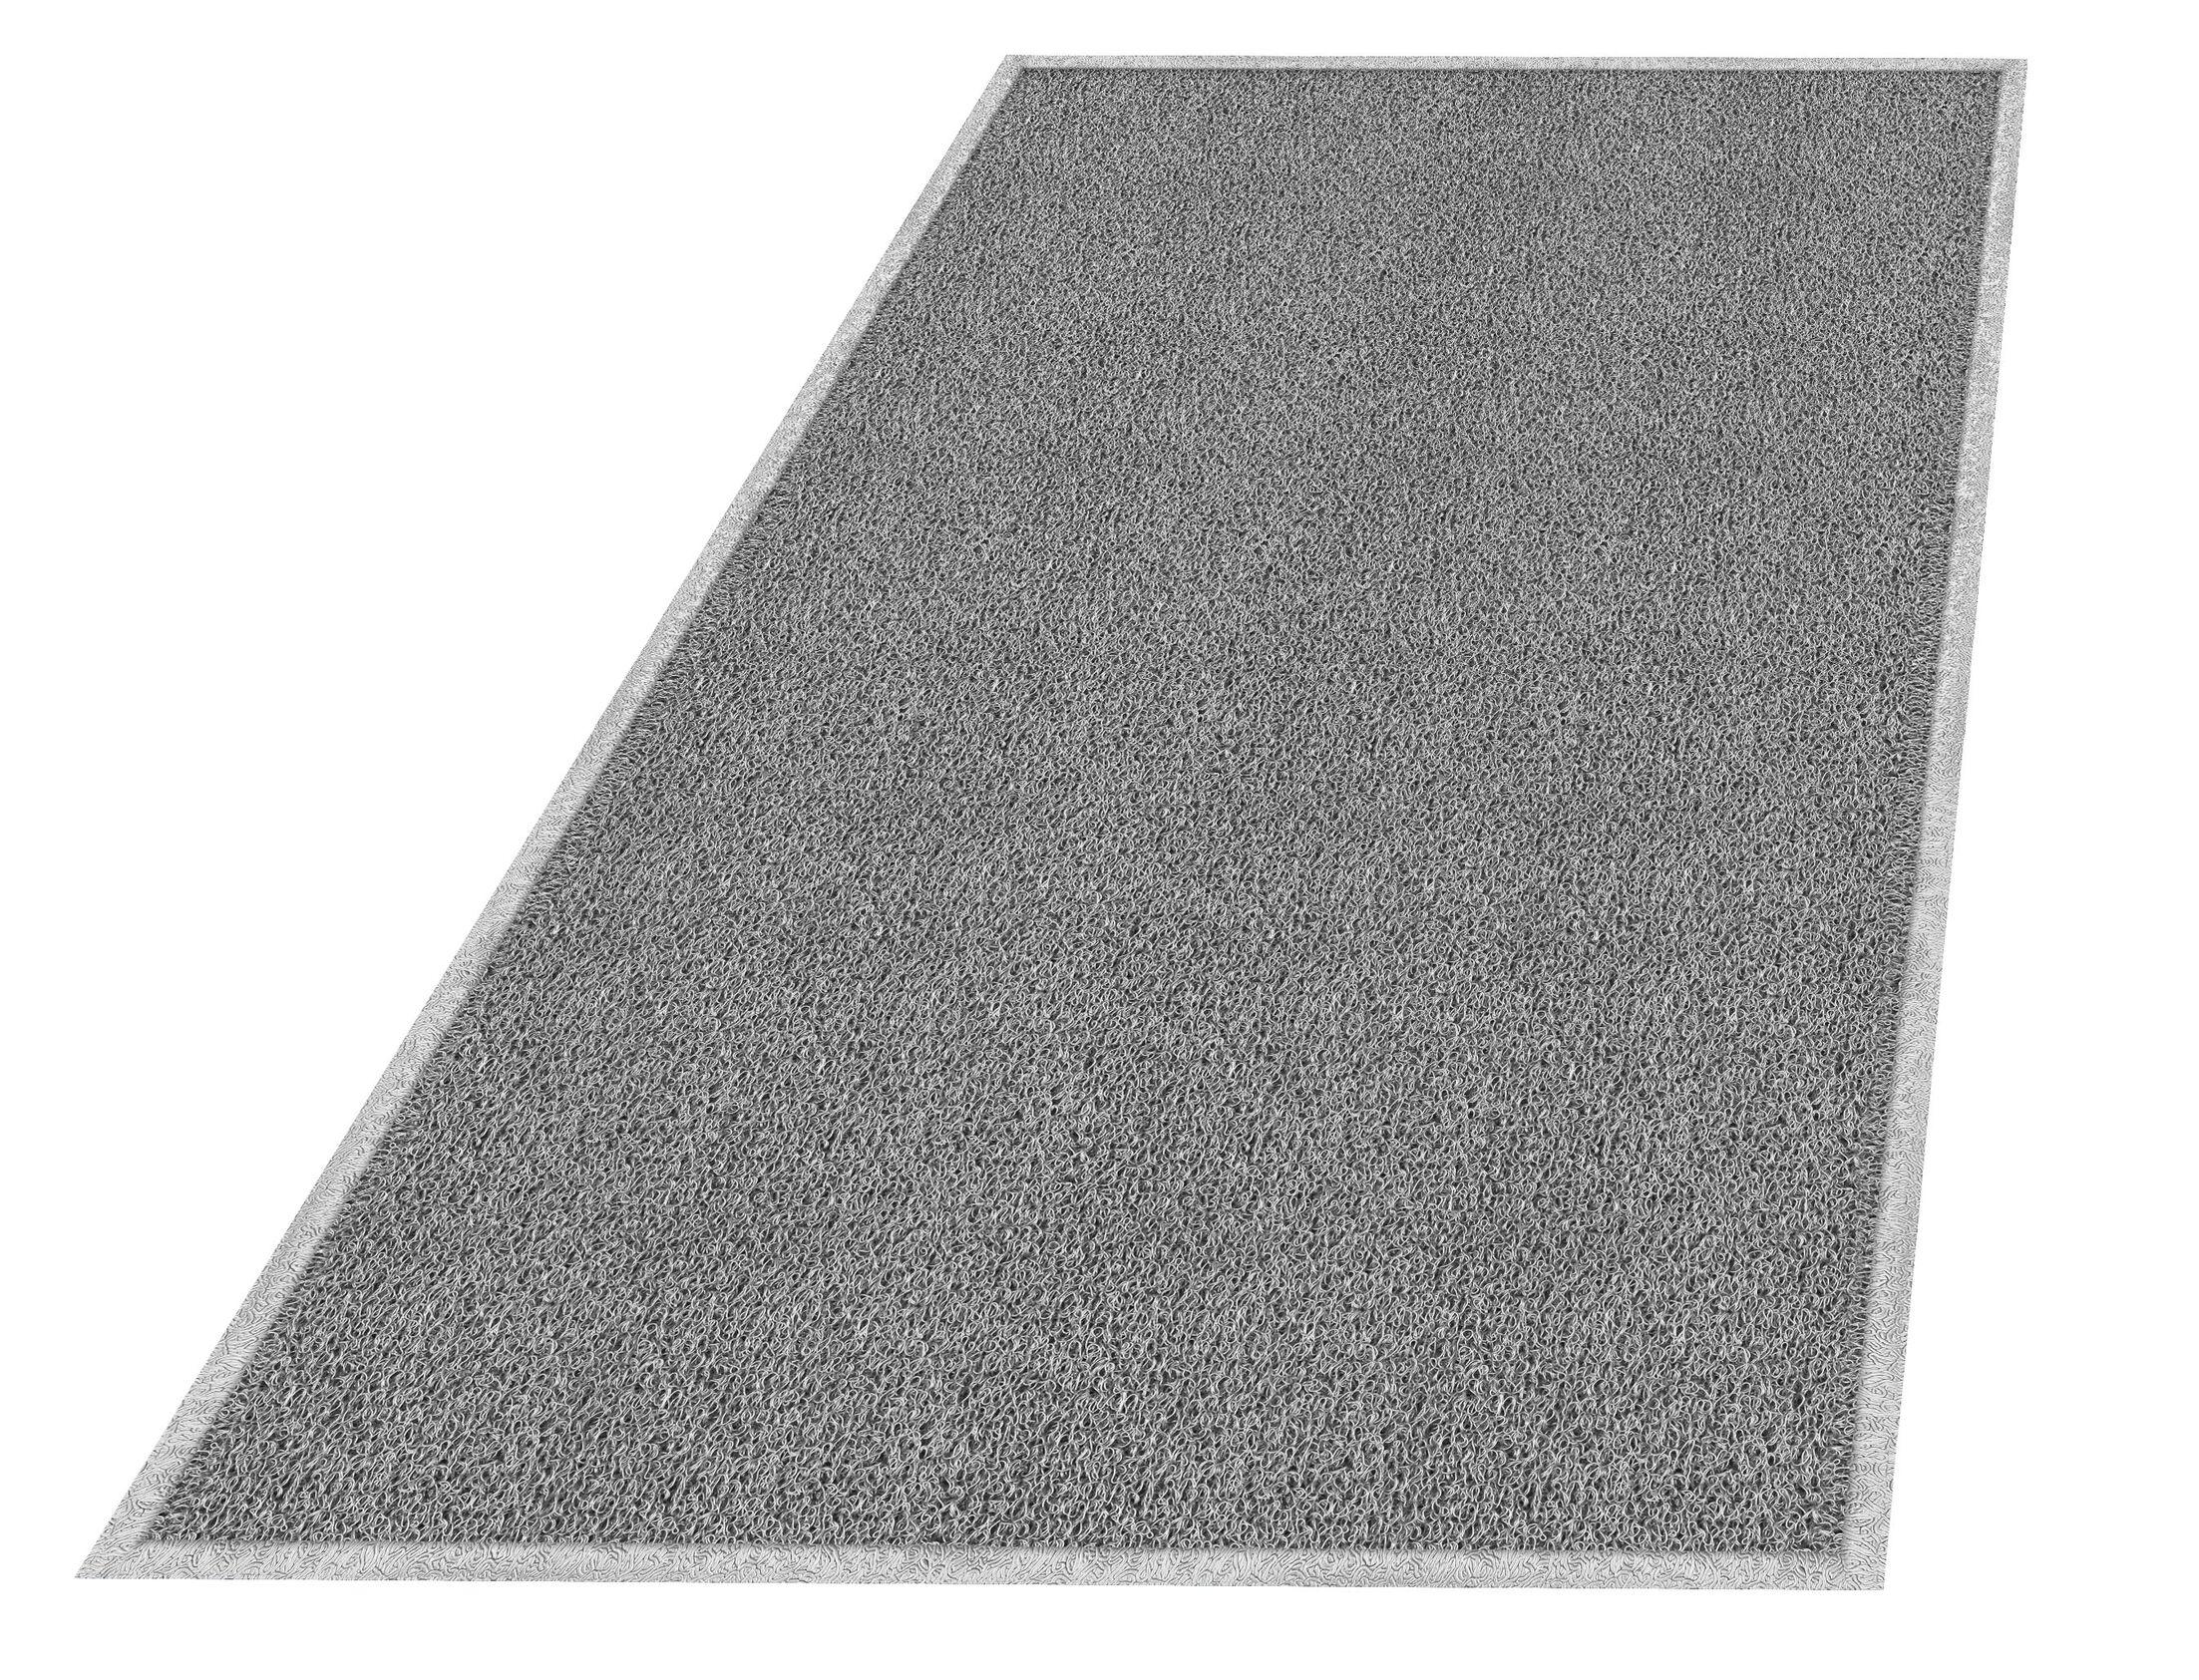 Wayfarer Utility Mat Mat Size: Rectangle 4' x 6', Color: Gray